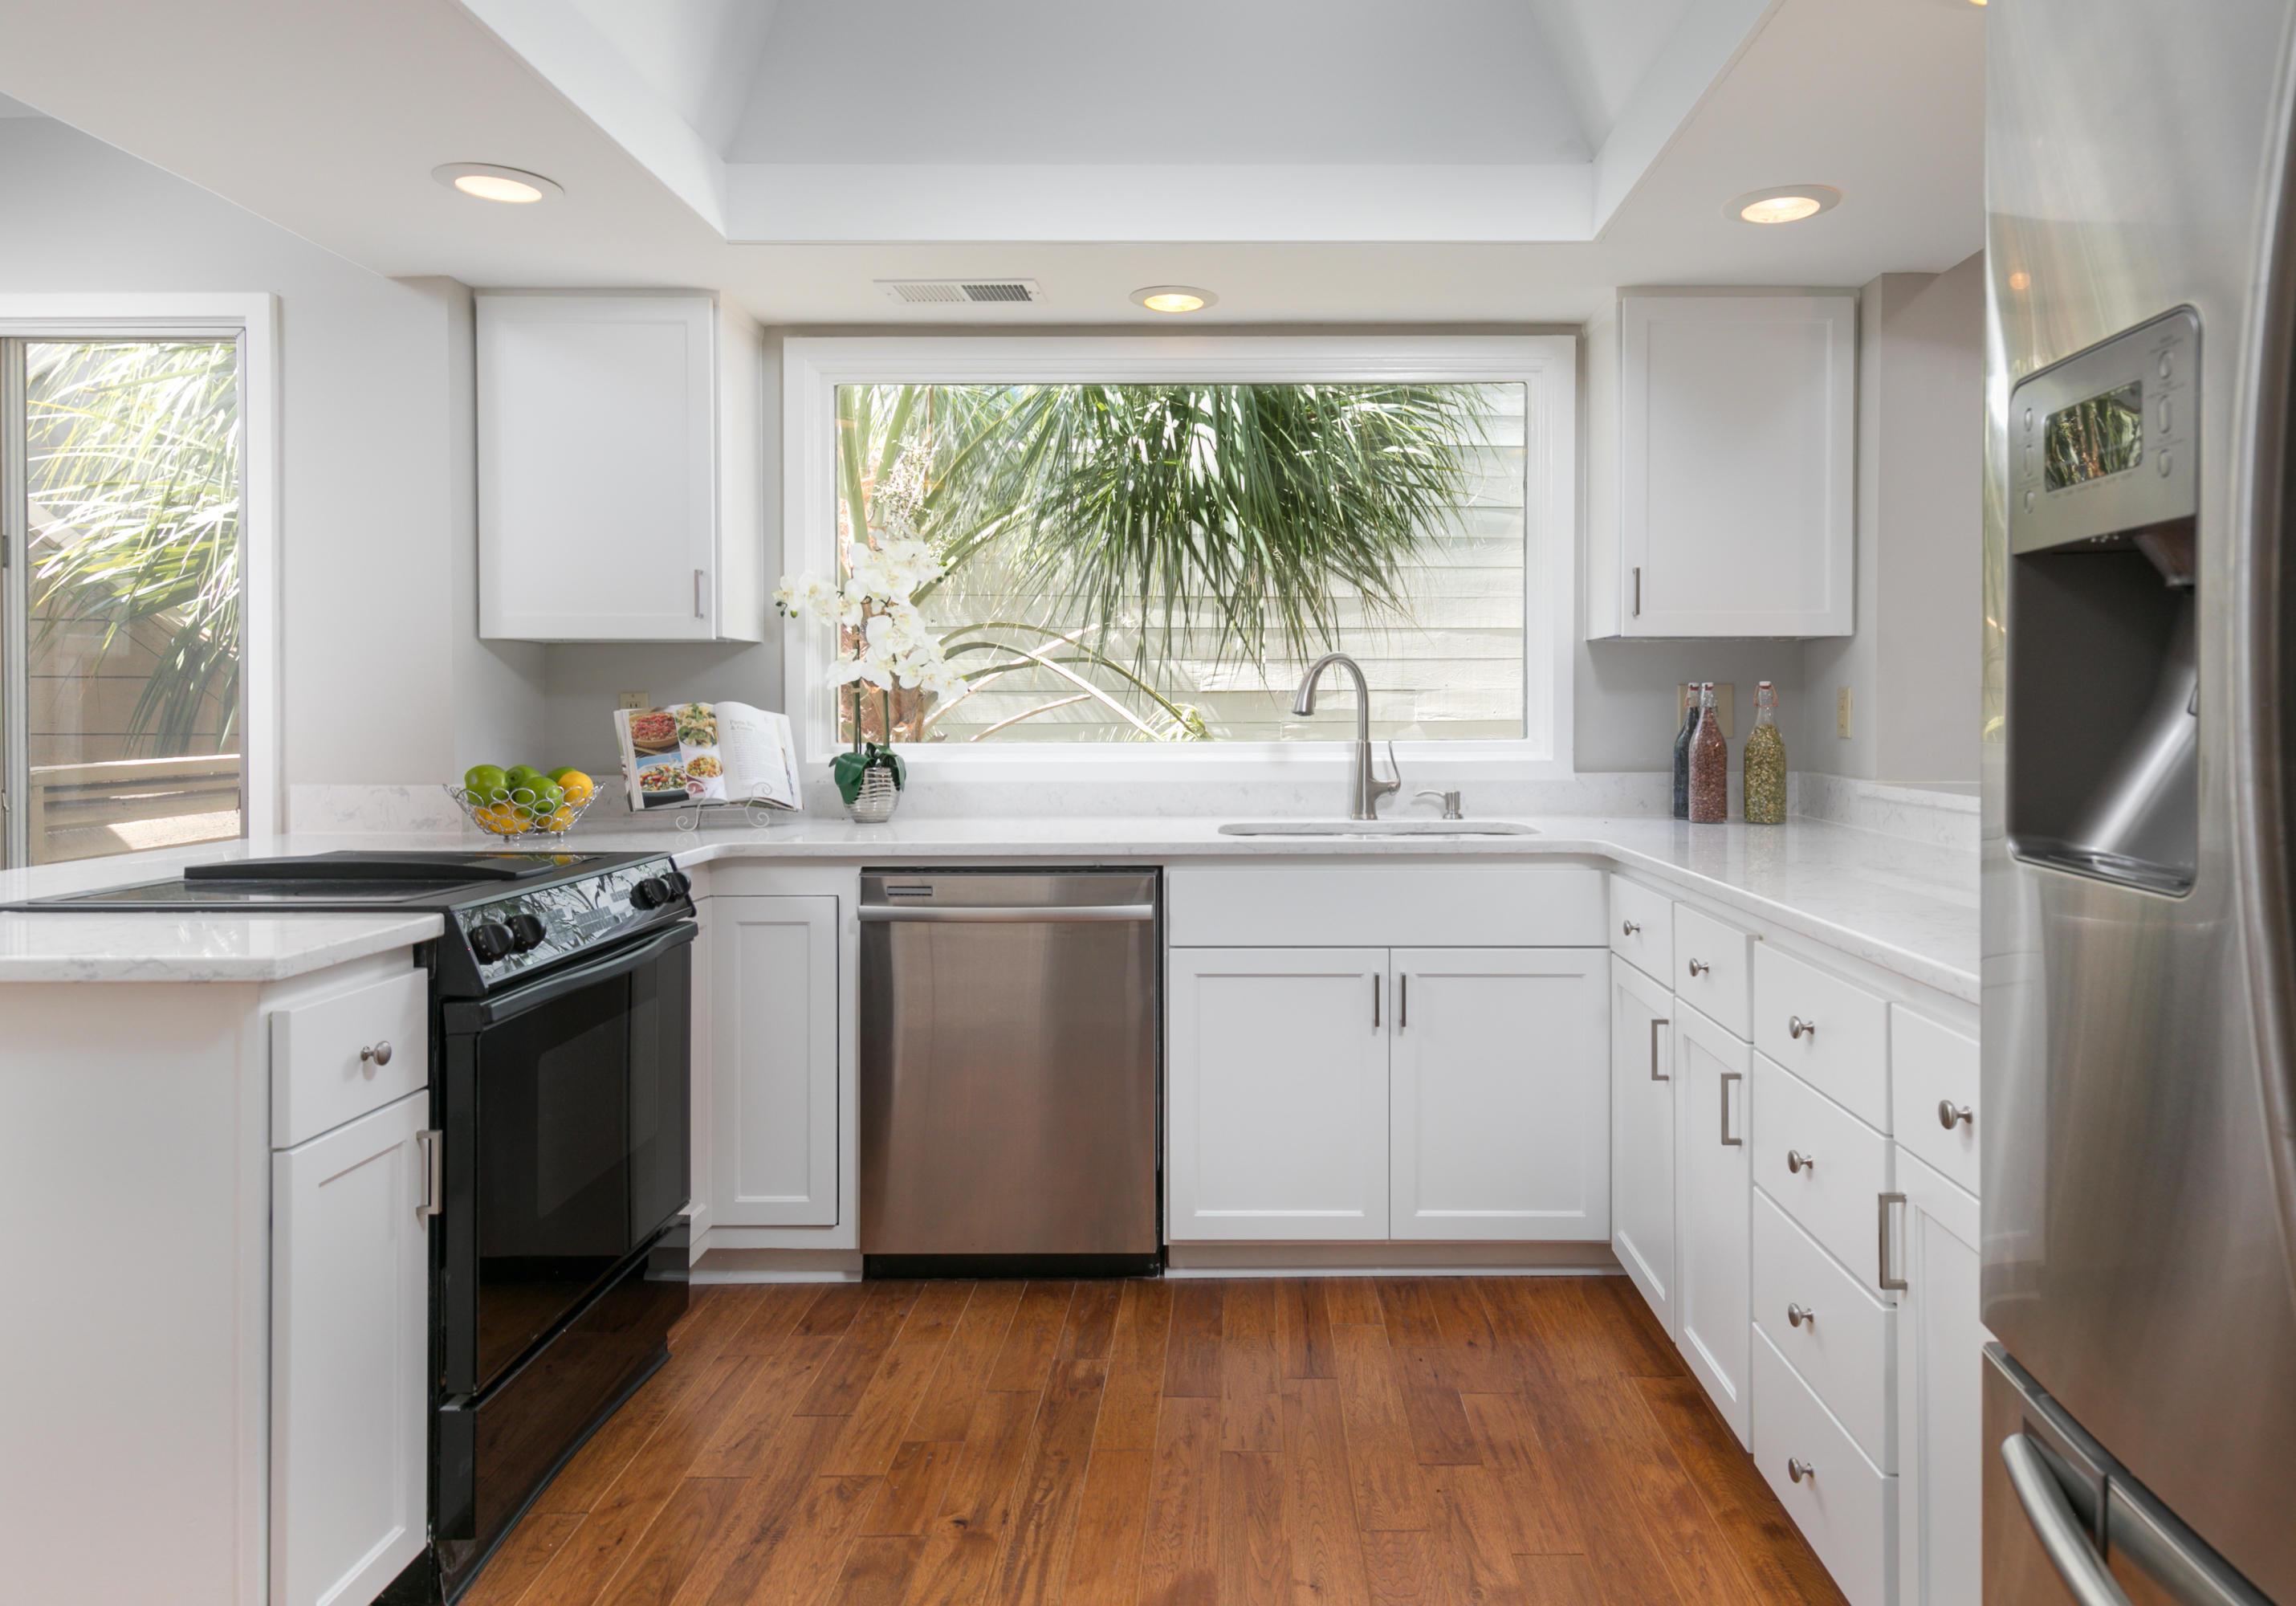 Seabrook Island Homes For Sale - 1004 Embassy Row, Seabrook Island, SC - 27